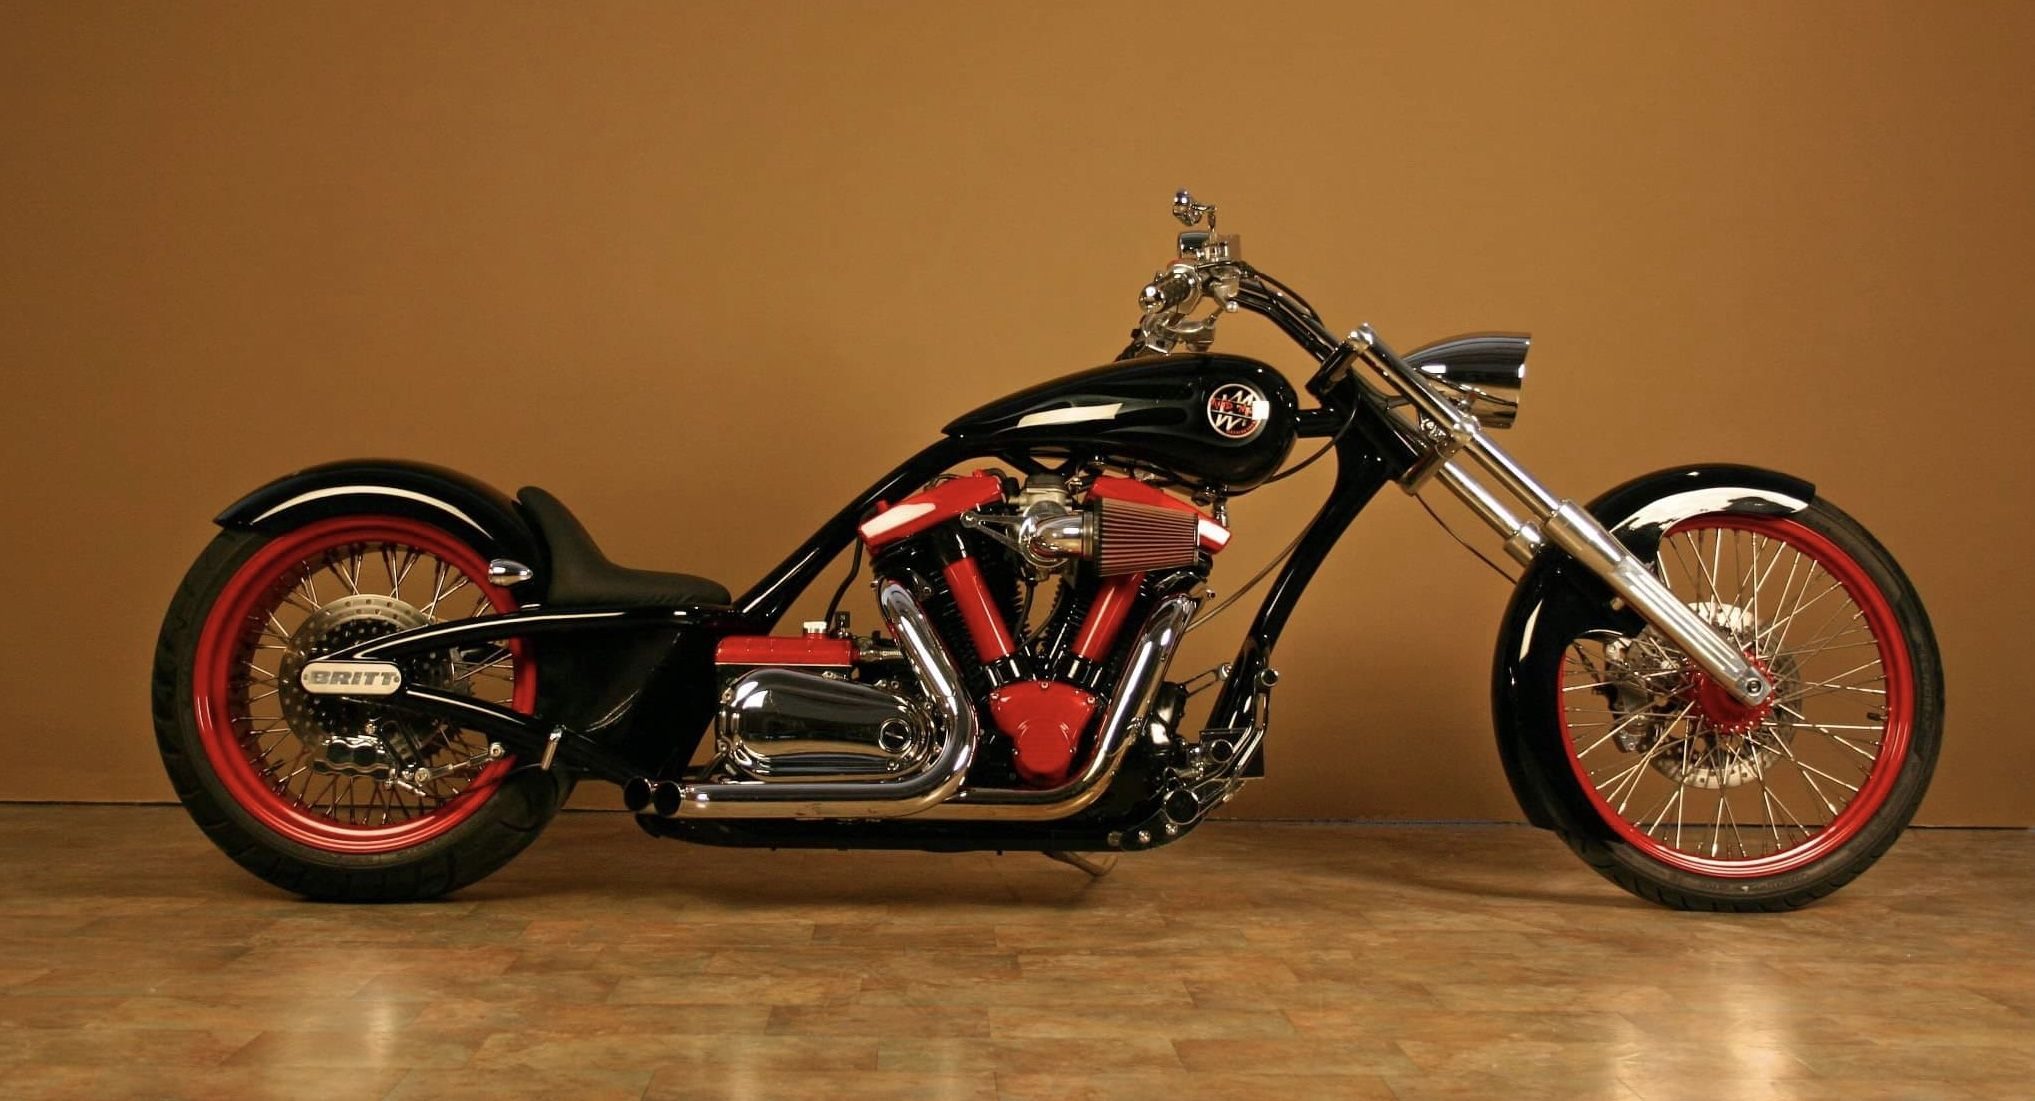 Pin By 17 Customs On Britt Bikes Bike Vehicles Motorcycle